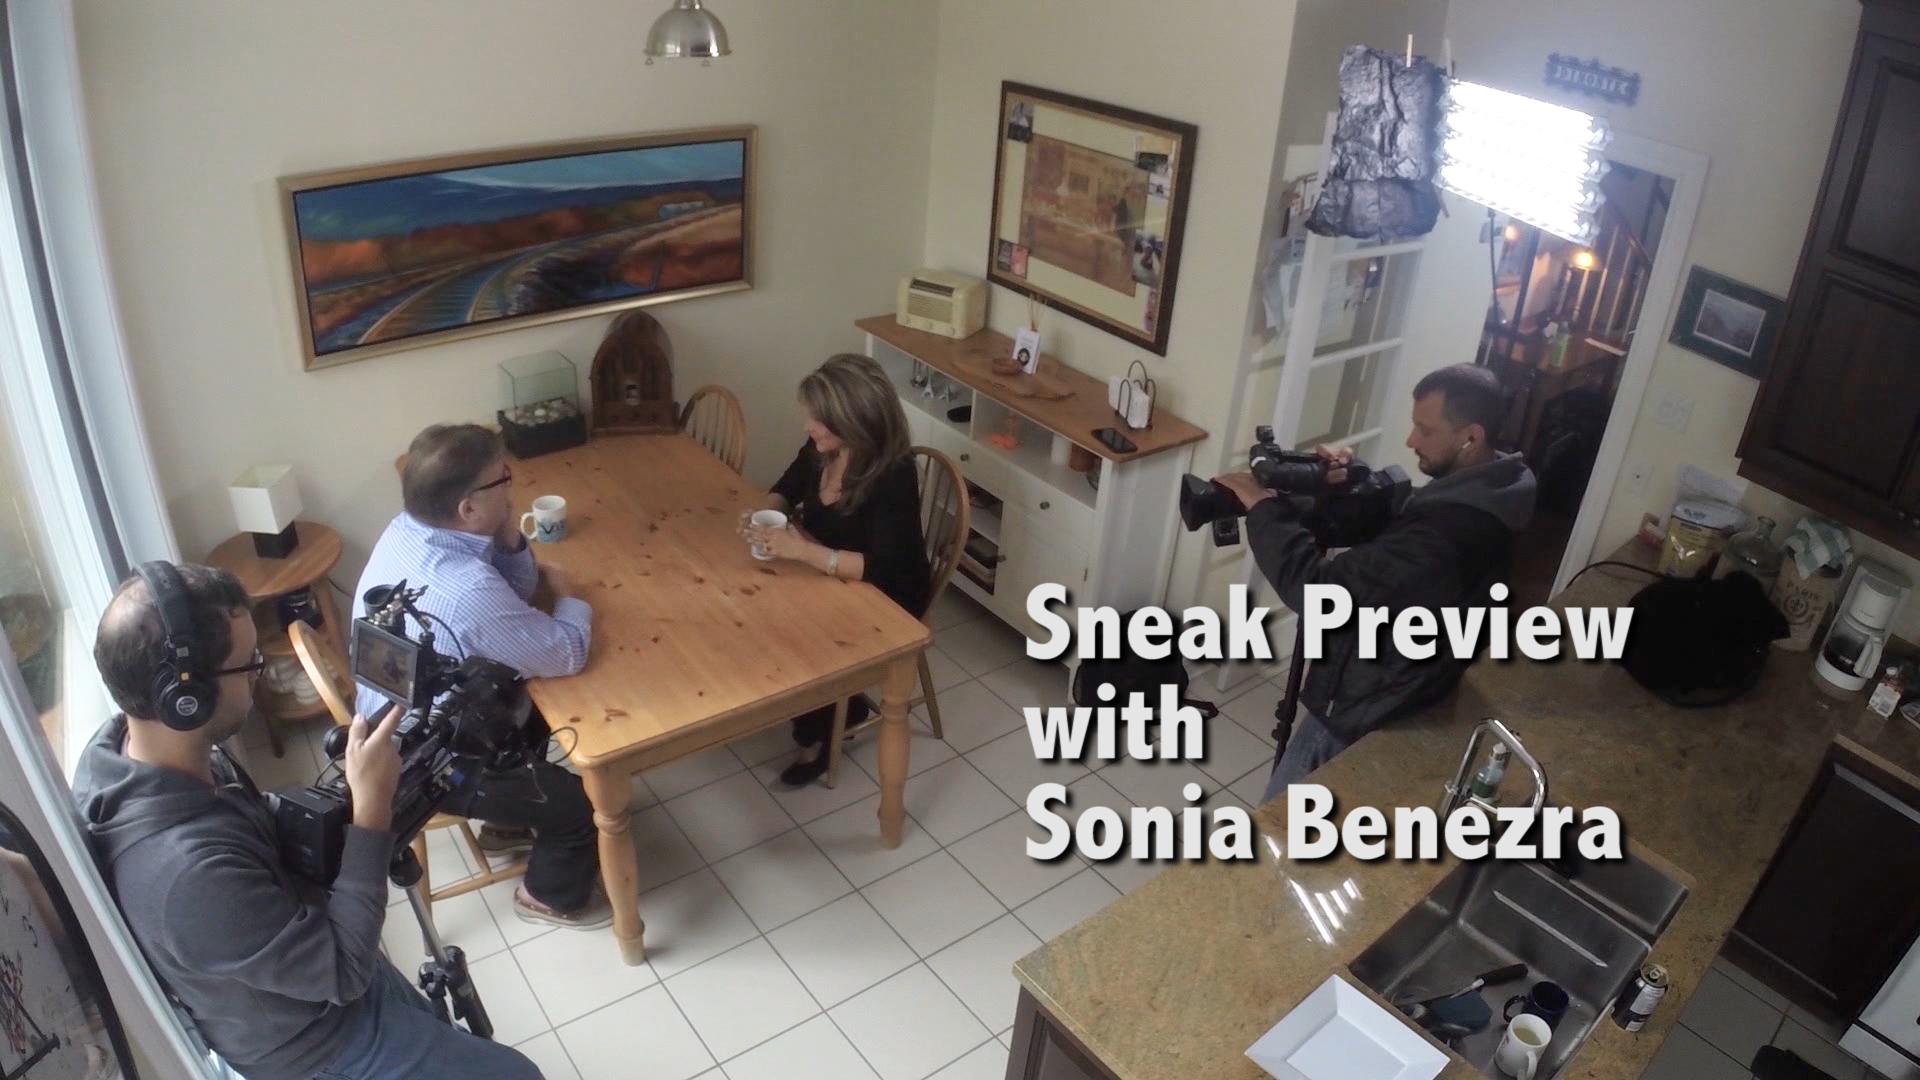 Sonia Benezra Preview 5